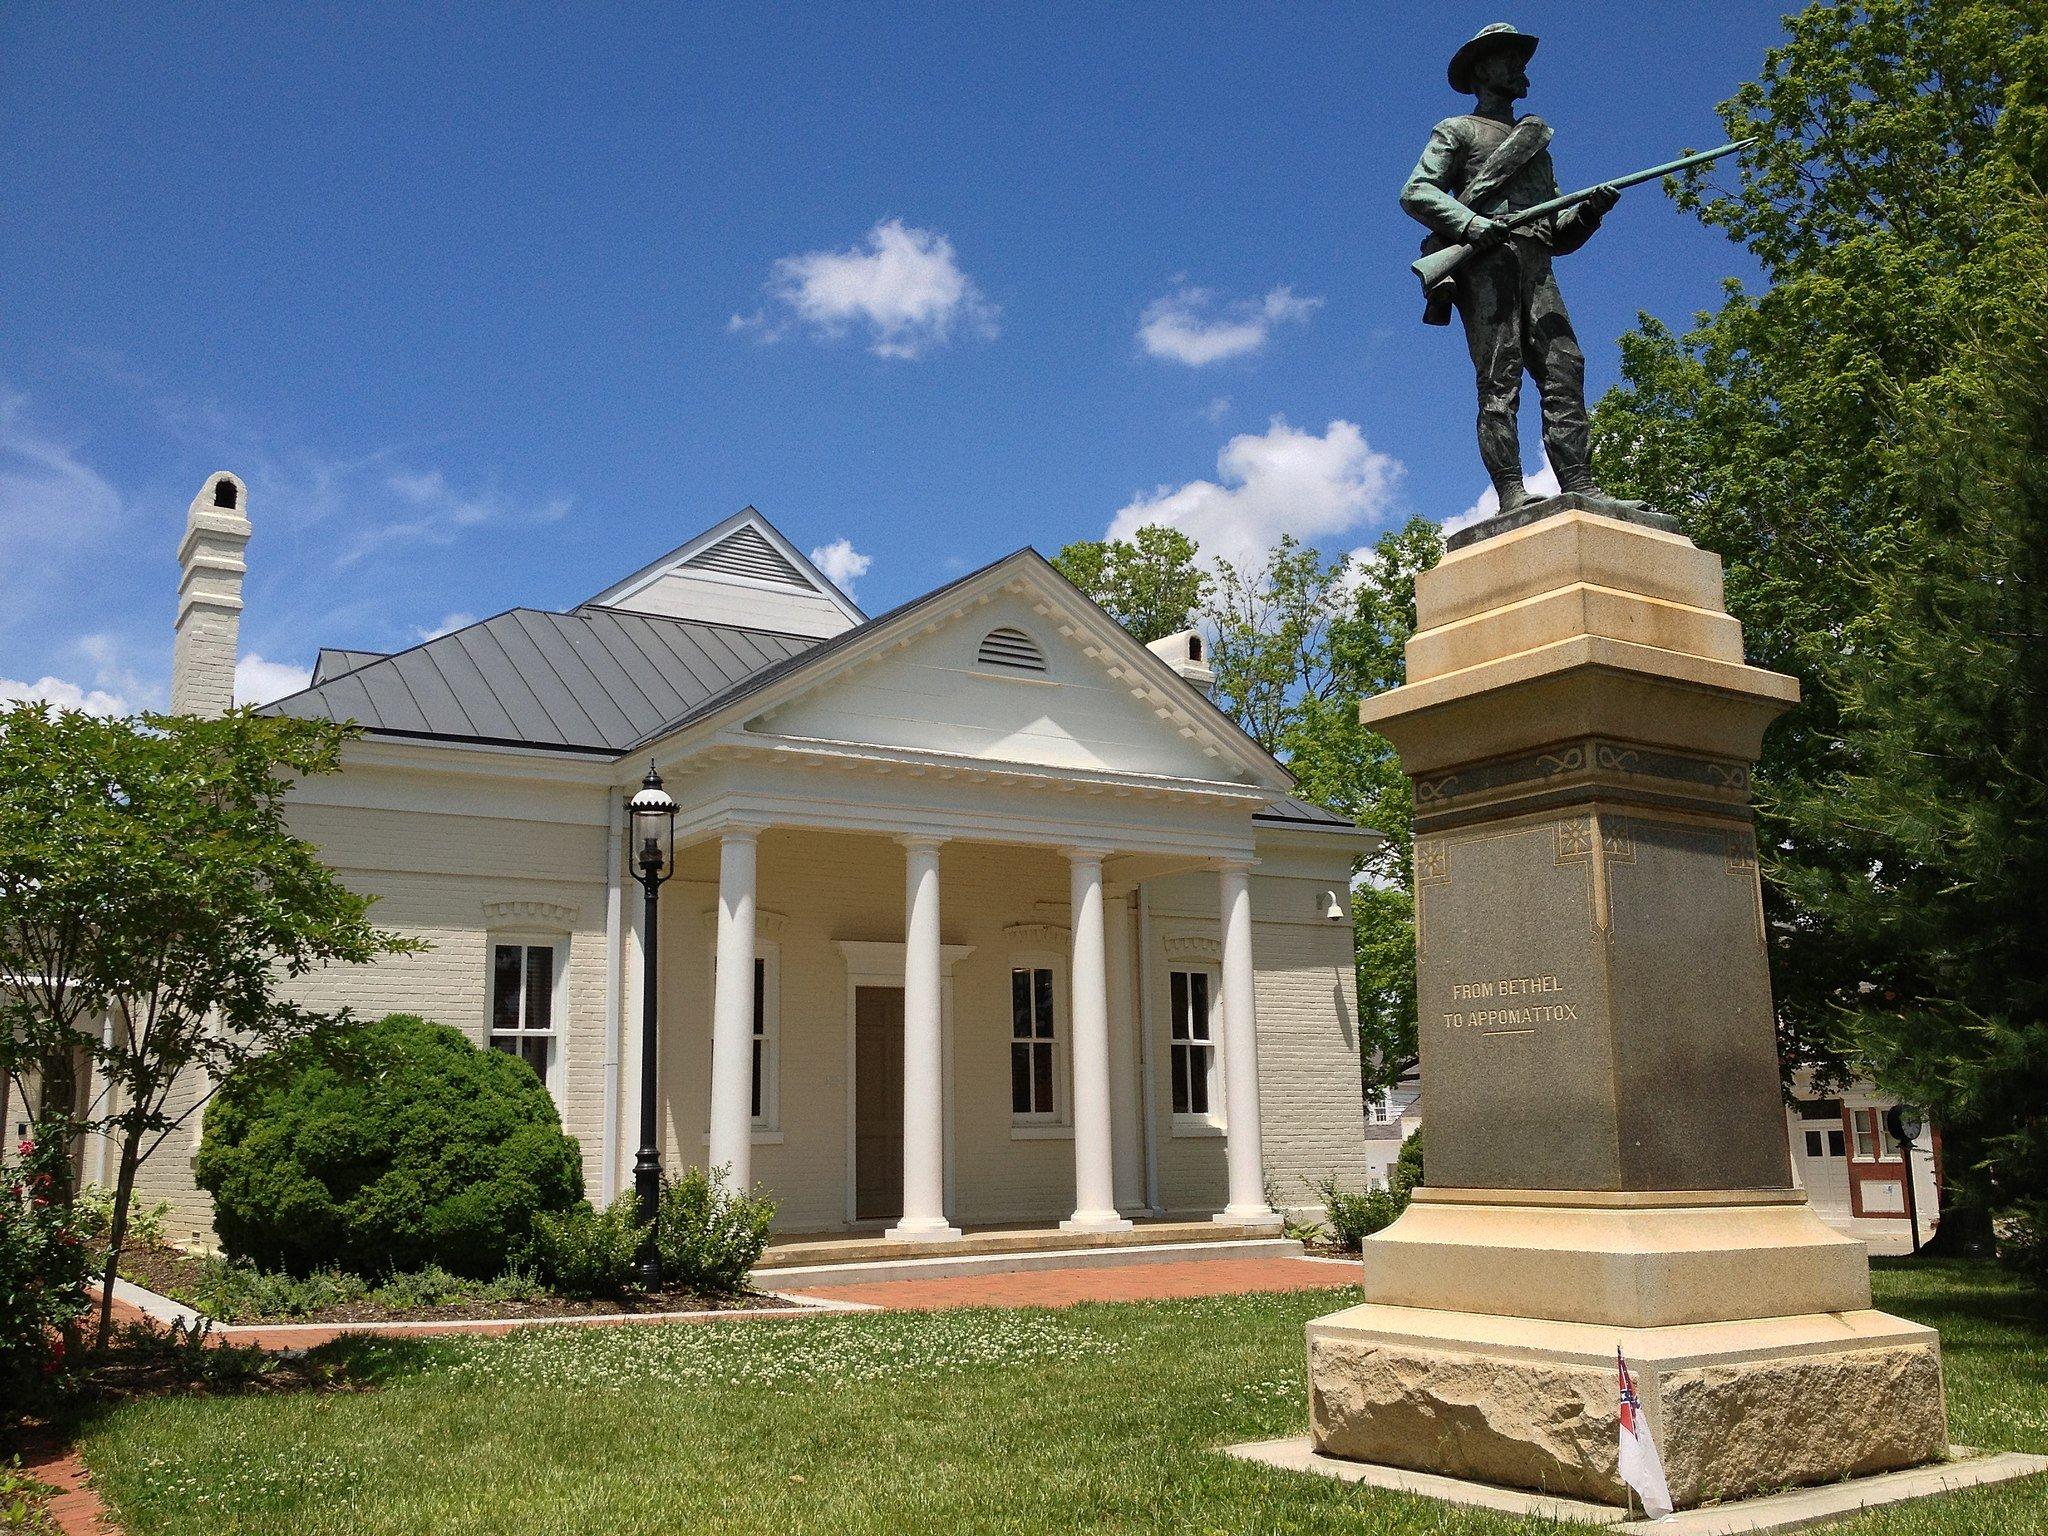 Mecklenburg County Courthouse in Boydton, Va.